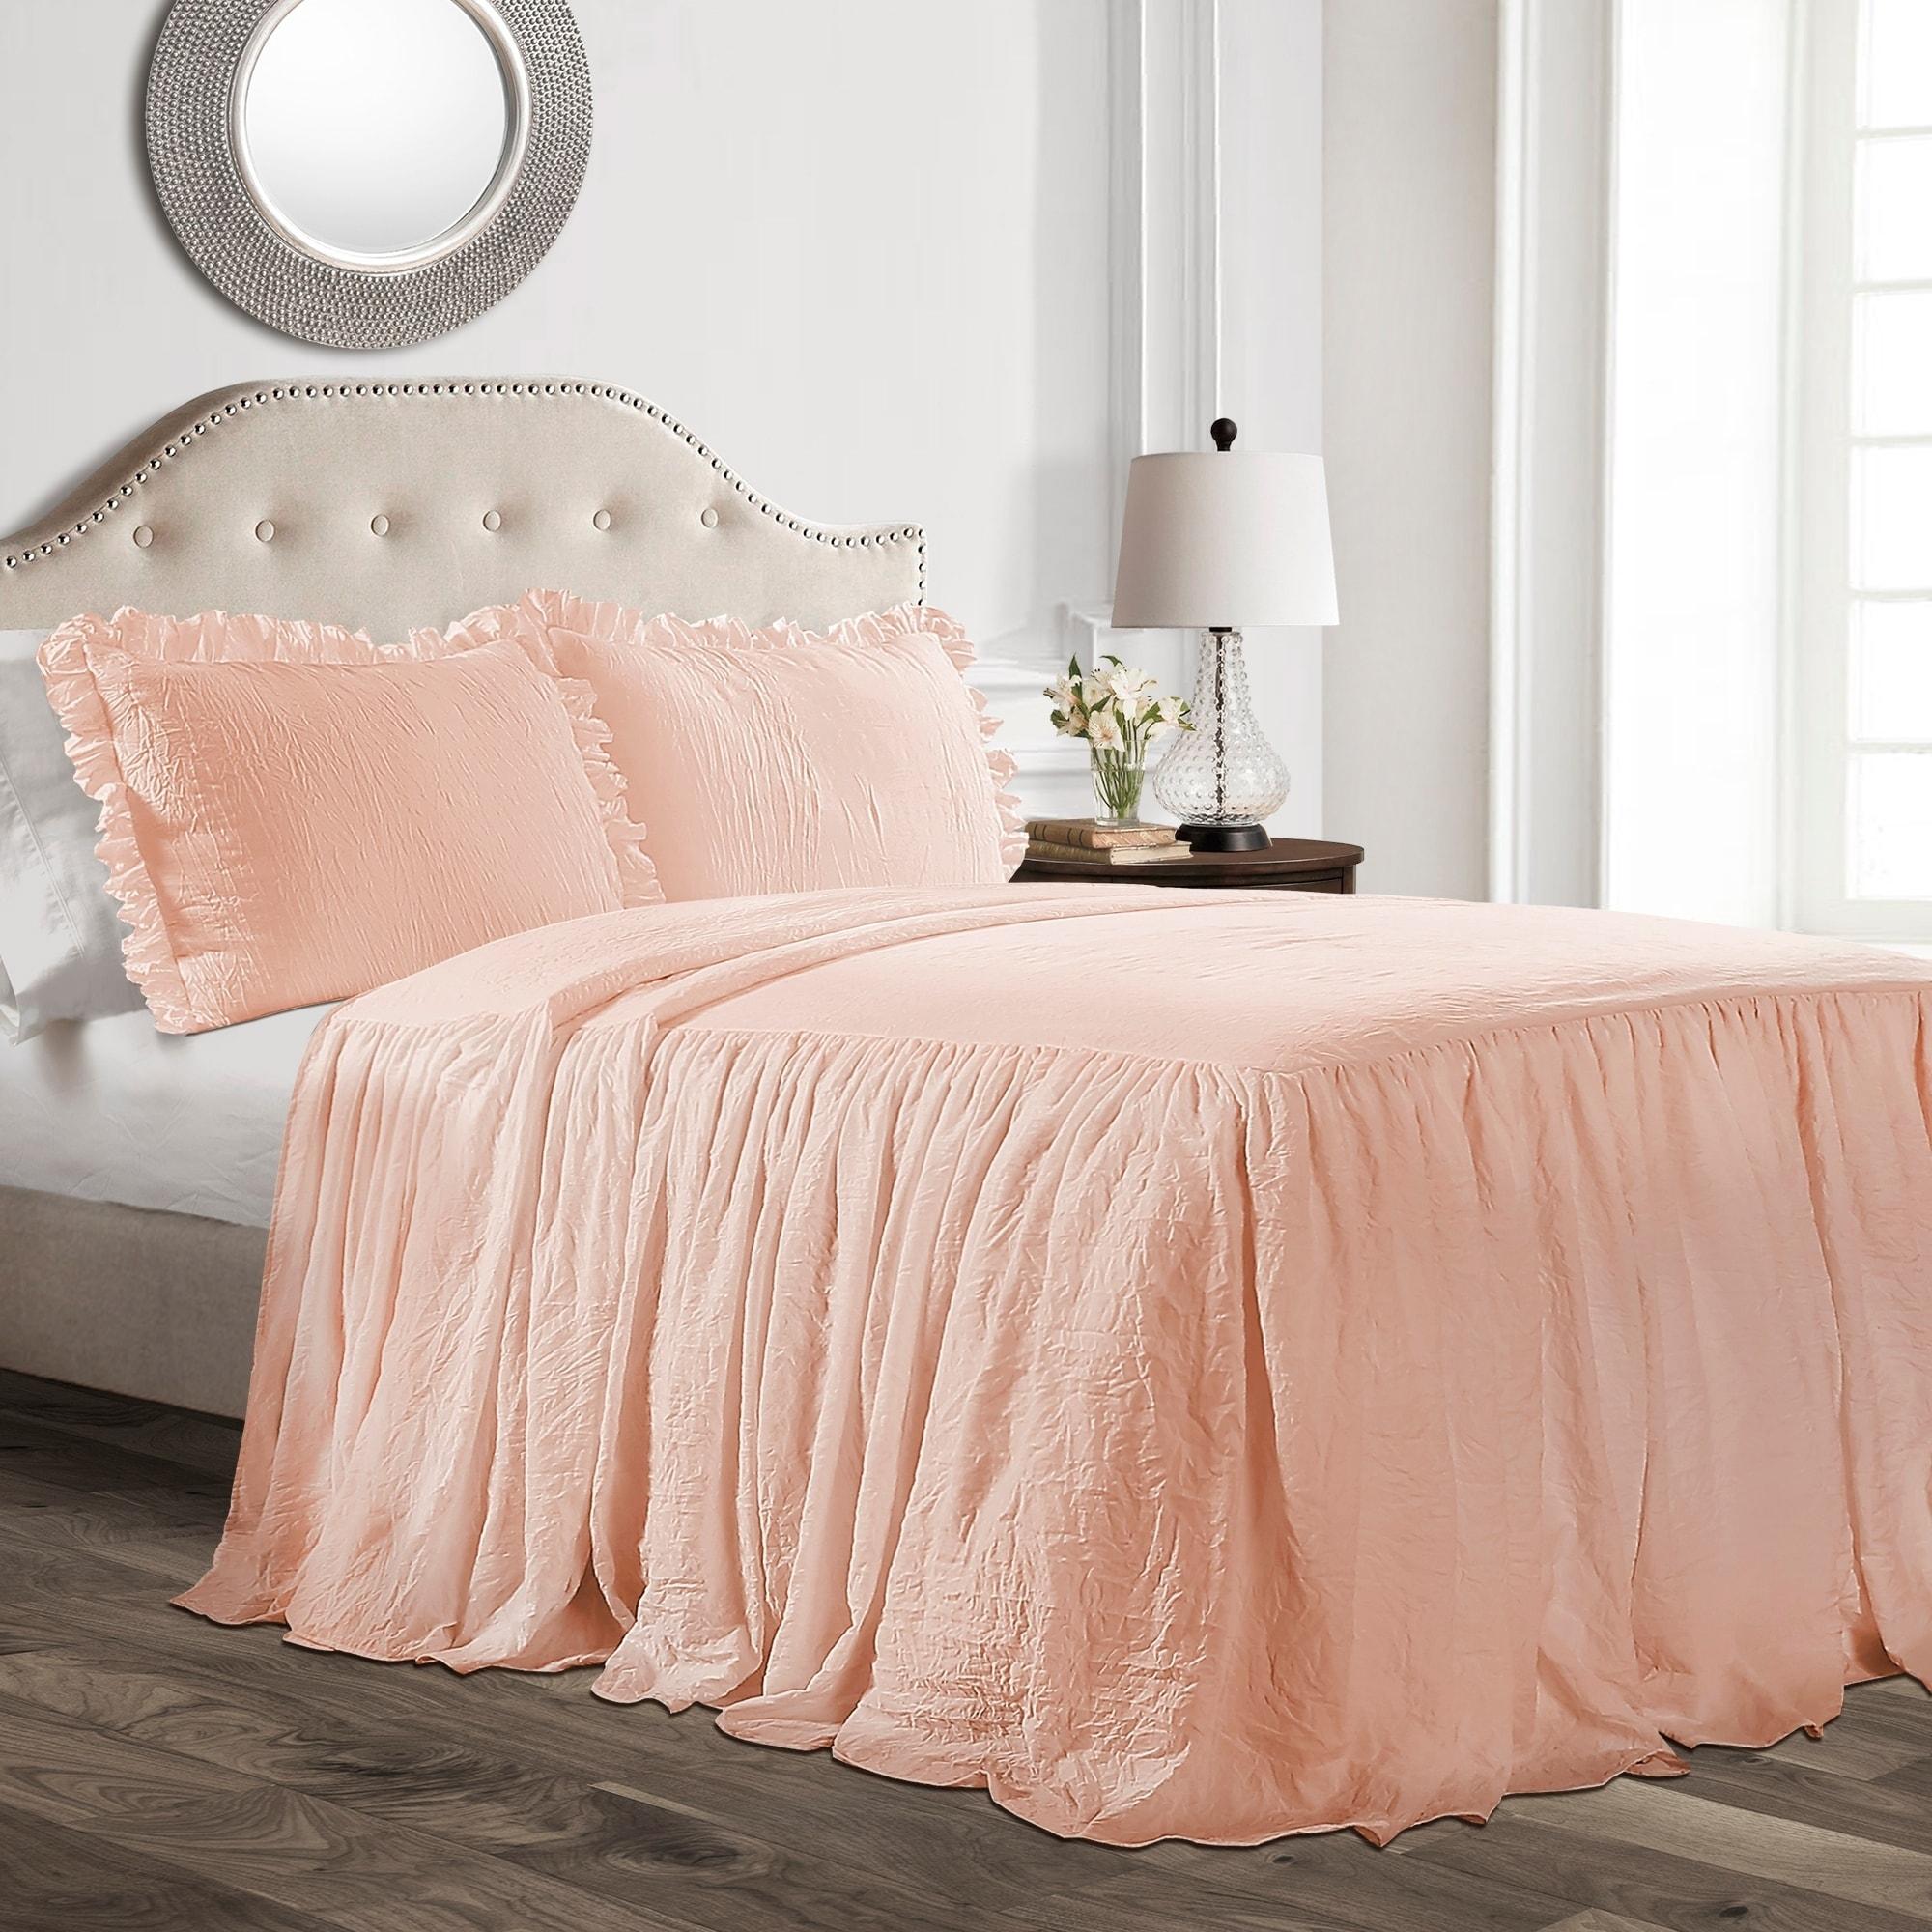 Lush Decor Ruffle Skirt Bedspread Set On Free Shipping Today 22543761